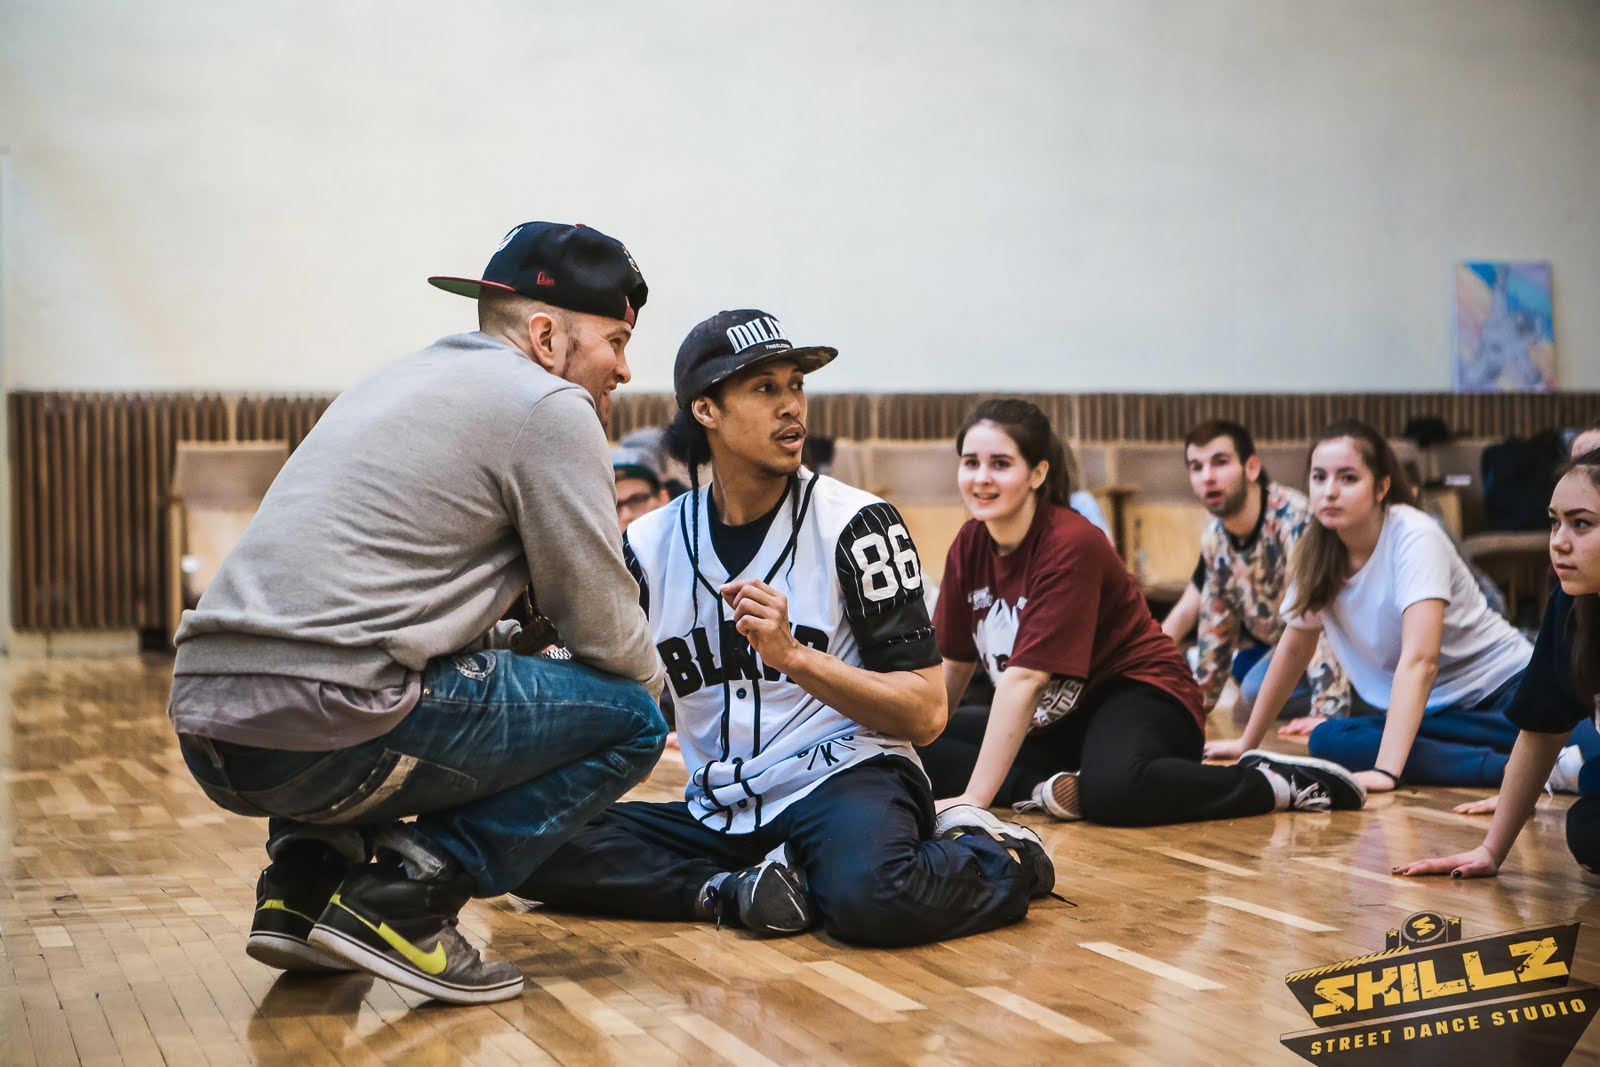 Dedson Hip Hop seminaras (FRA) - IMG_6678.jpg